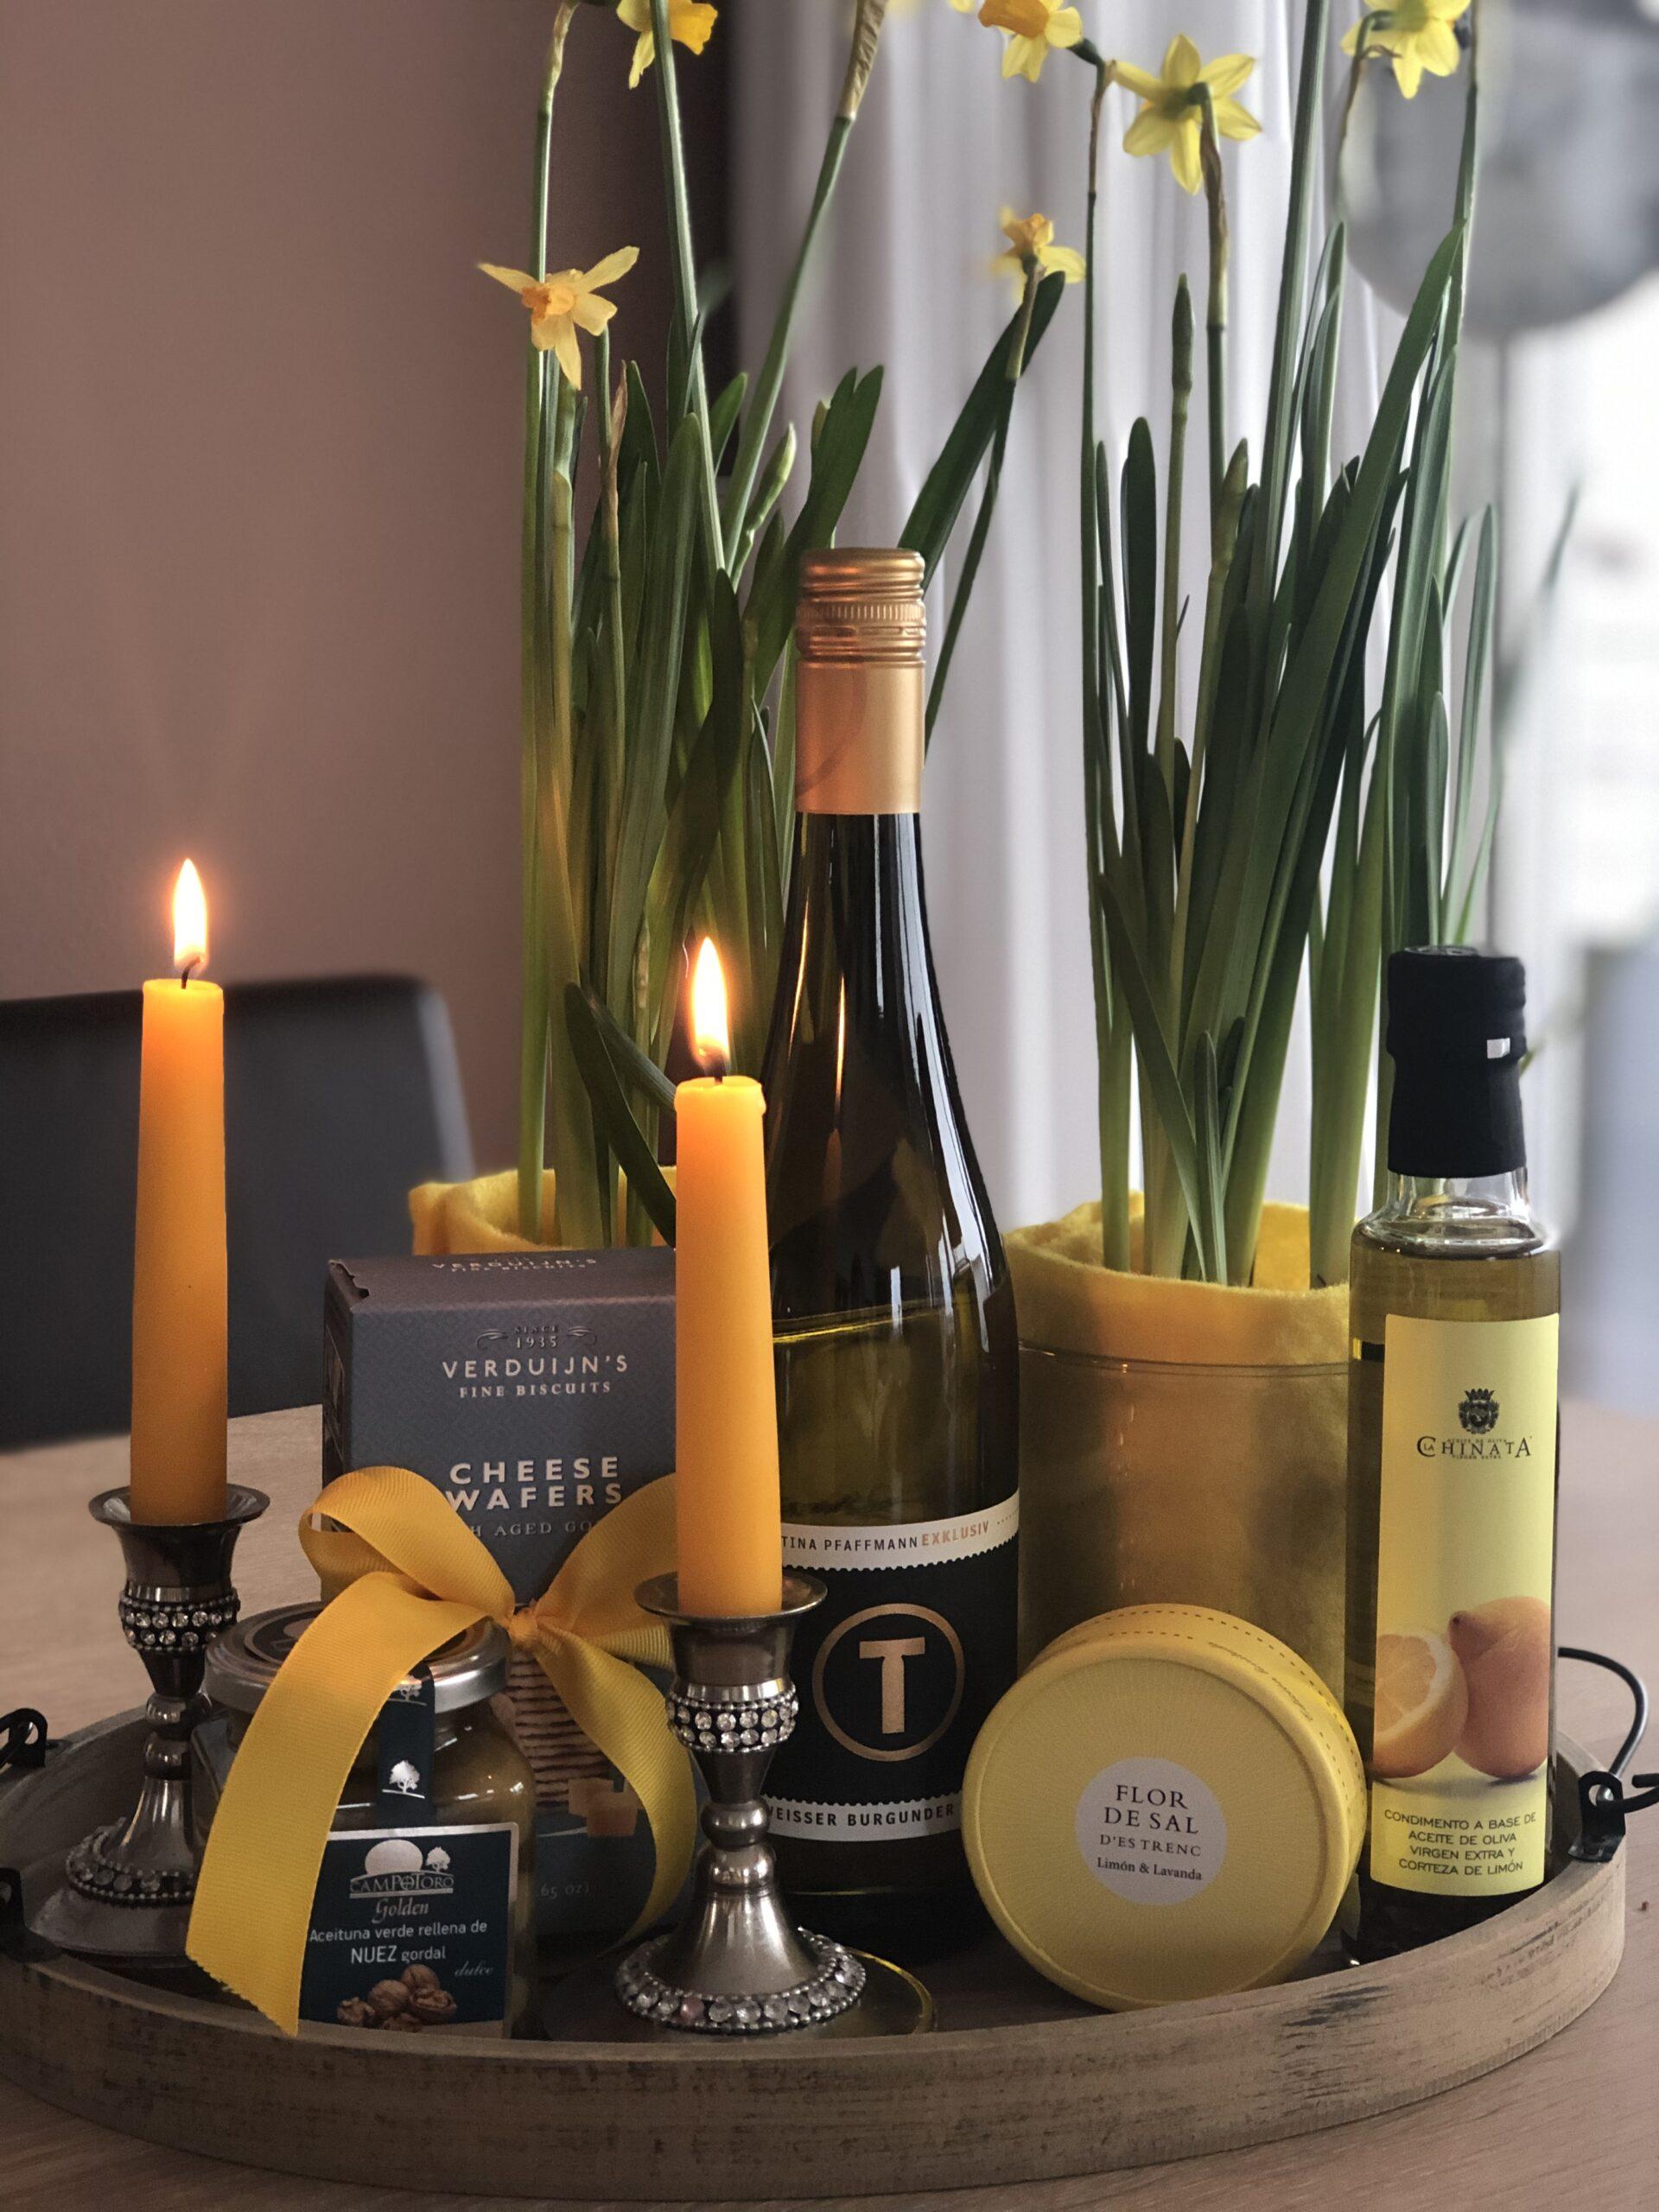 Geschenkpaket-Weissburgunder-Tina-Pfaffmann-Oliven-Zitronenoel-Flor-de-sal-Kaesegebaeck